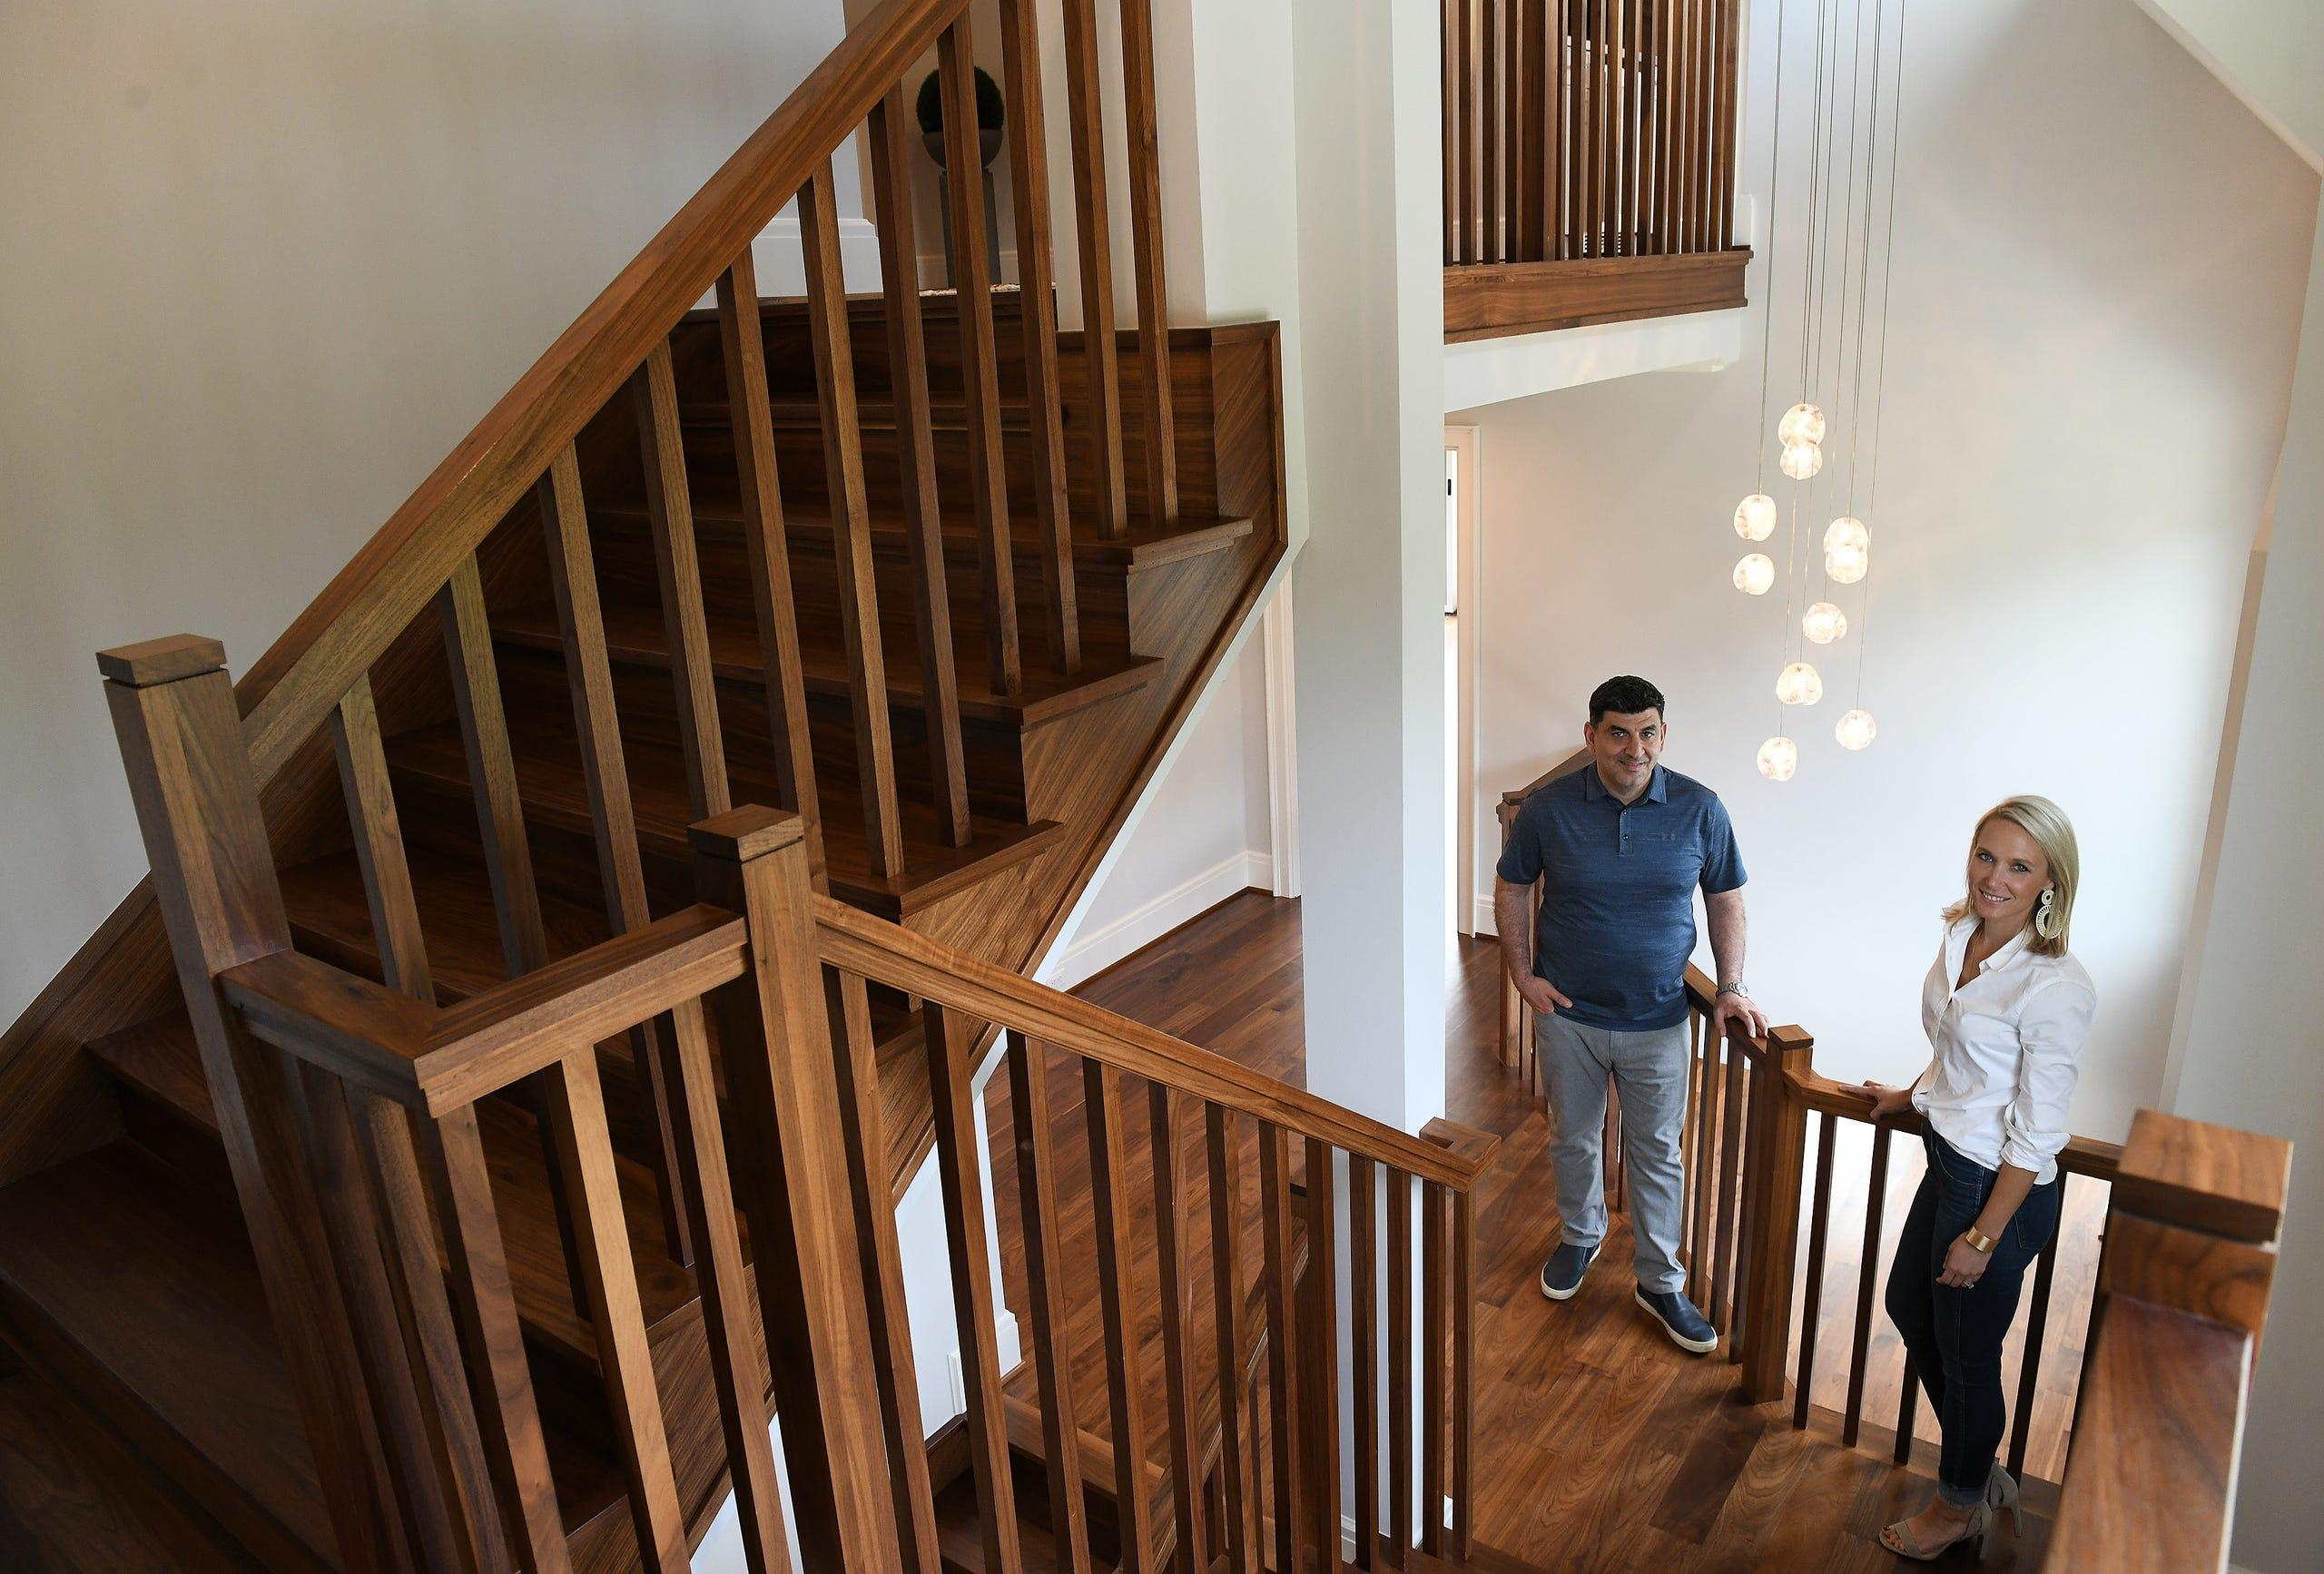 Birmingham Home Featured In Michigan Design Center Home Tour